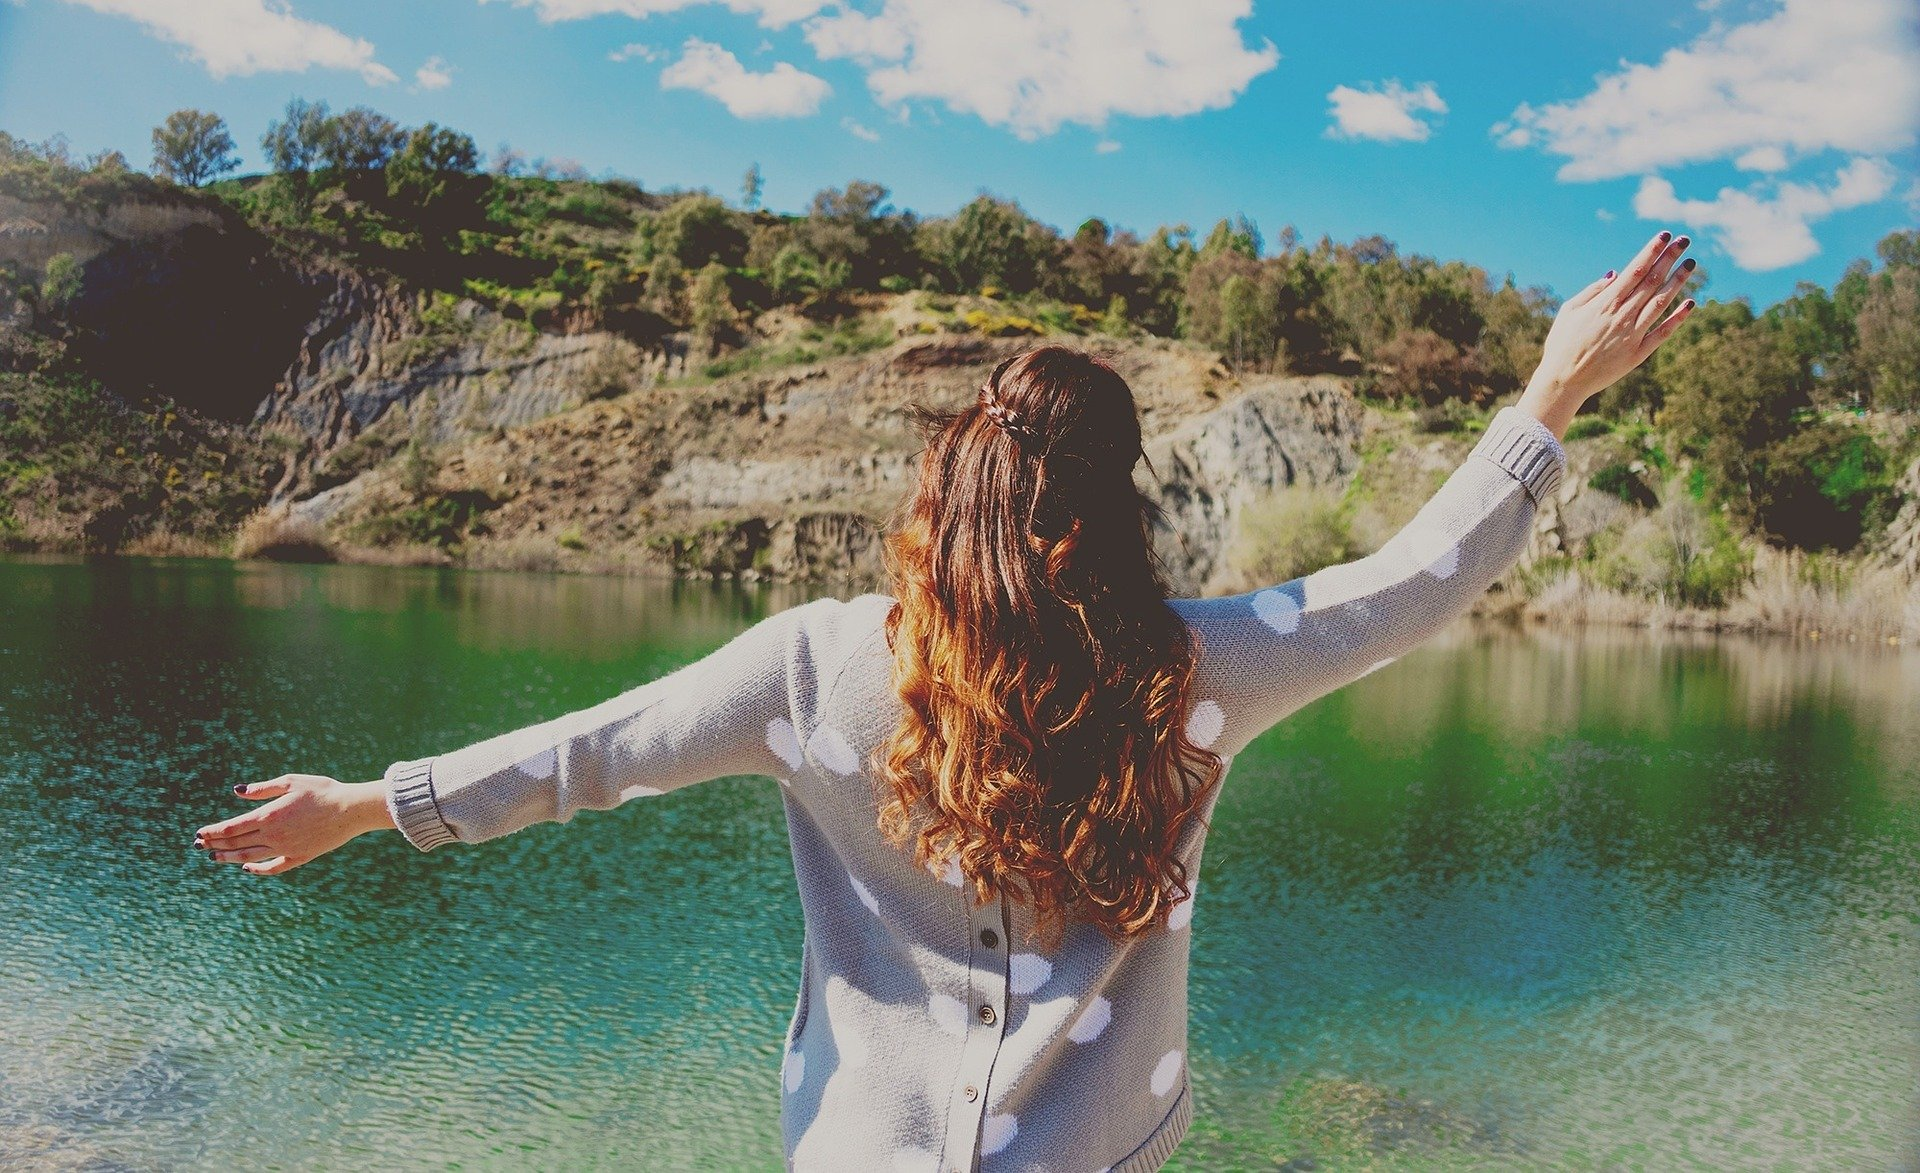 Žena a jezero